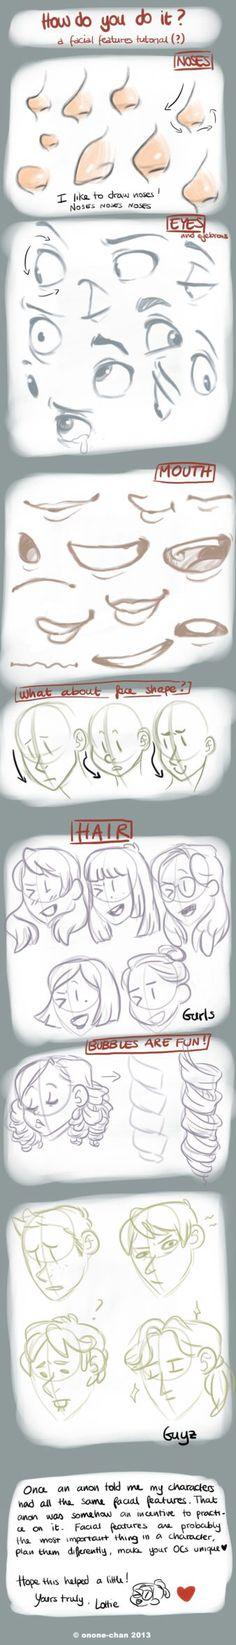 Dibuja un rostro